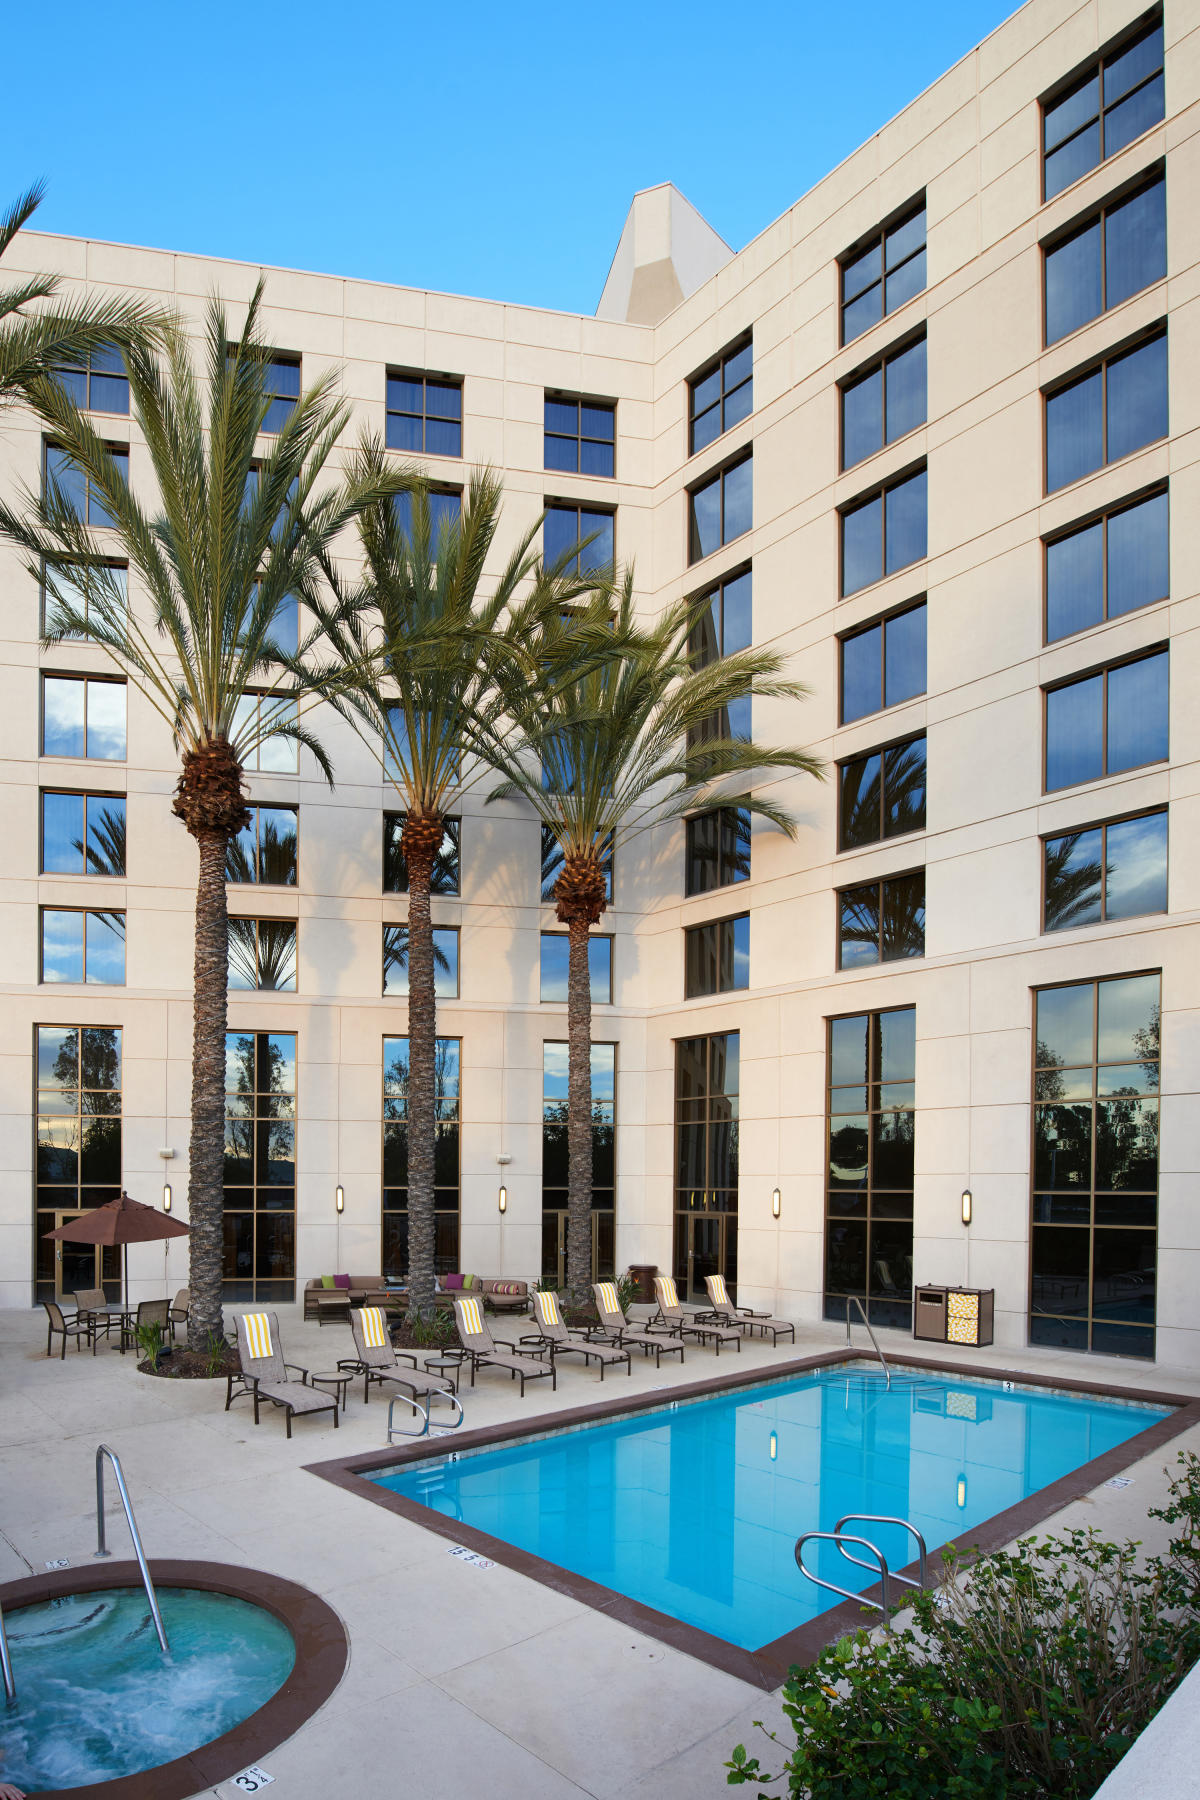 Doubletree hotel irvine spectrum irvine ca 92618 - Menzies hotel irvine swimming pool ...